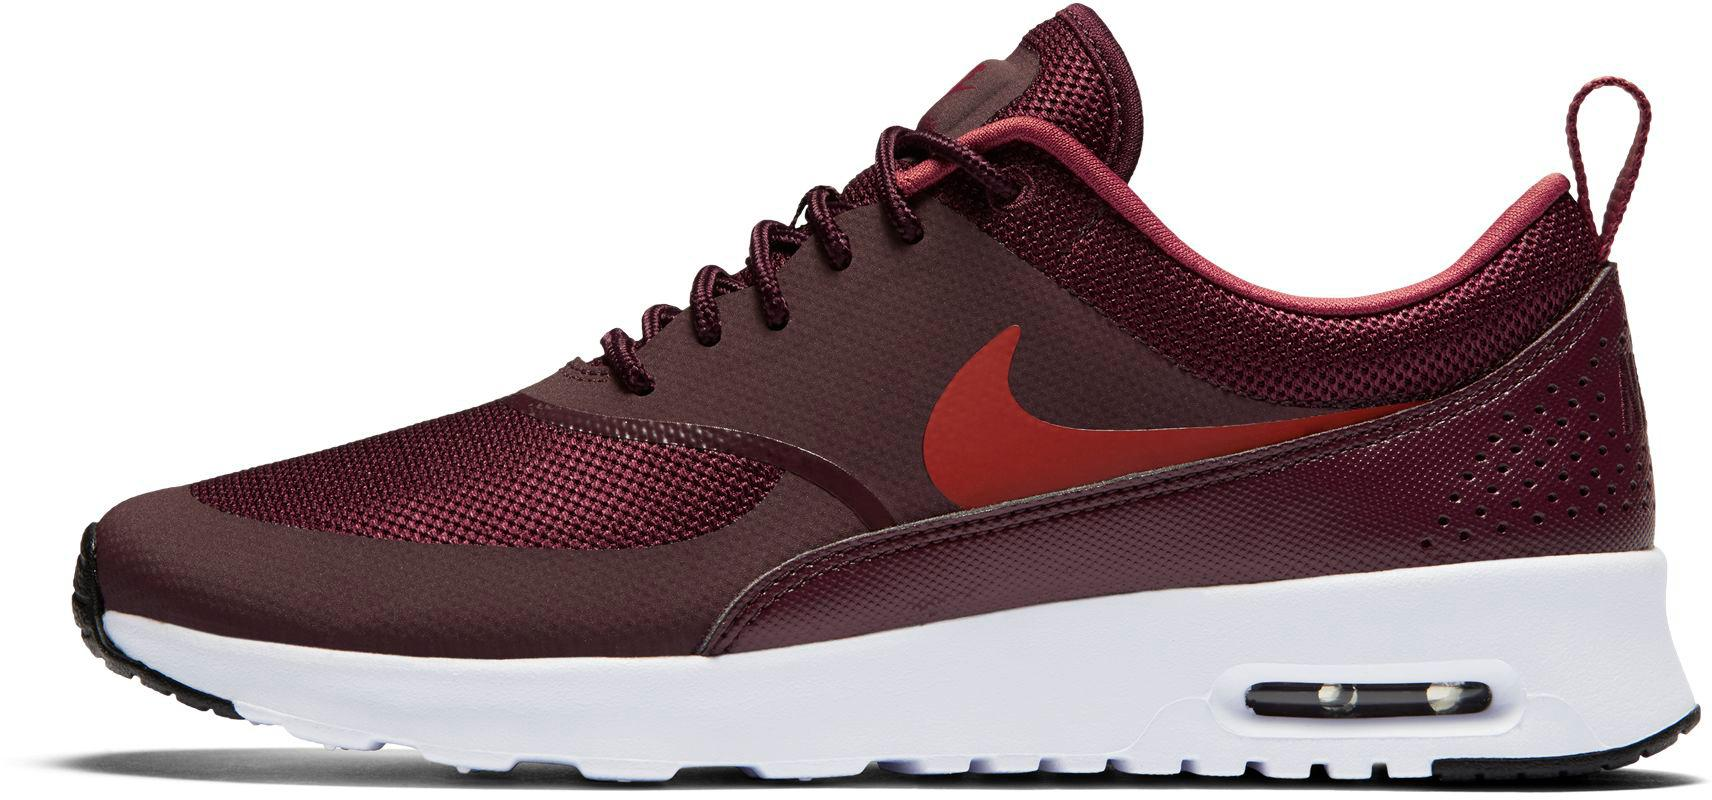 Nike Air Max Thea online bestellen | STYLEFILE SHOP